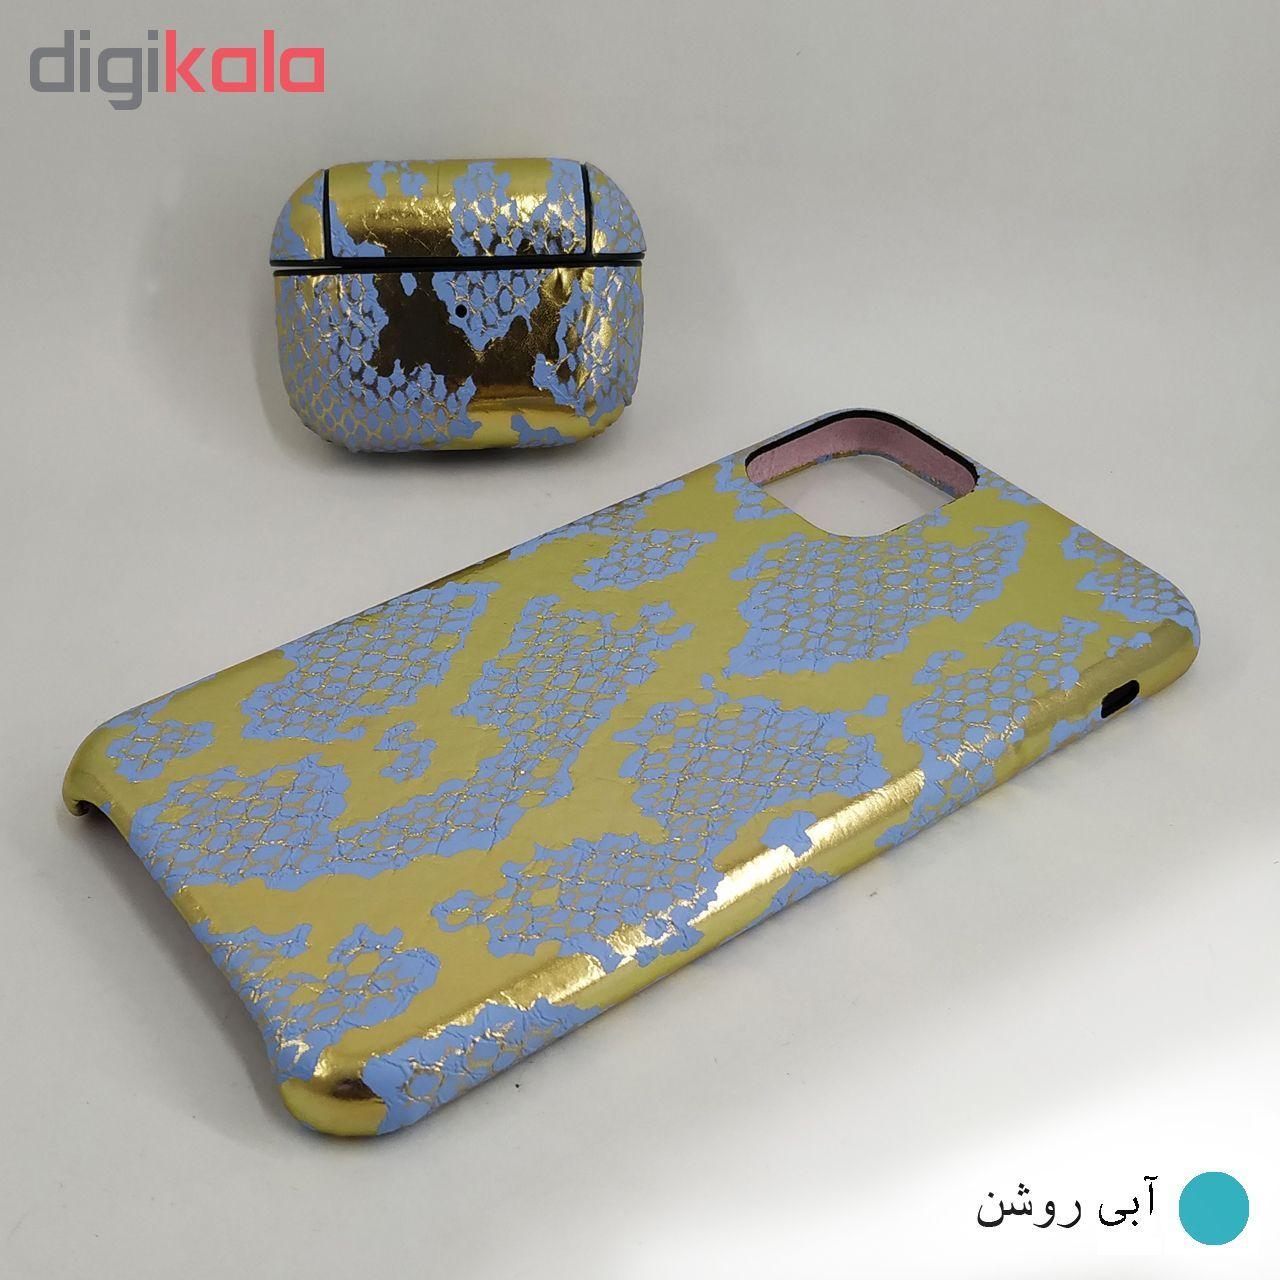 کاور ایت طرح پوست ماری کد 01 مناسب برای گوشی موبایل اپل Iphone 11 Pro Max به همراه کاور کیس اپل ایرپاد پرو